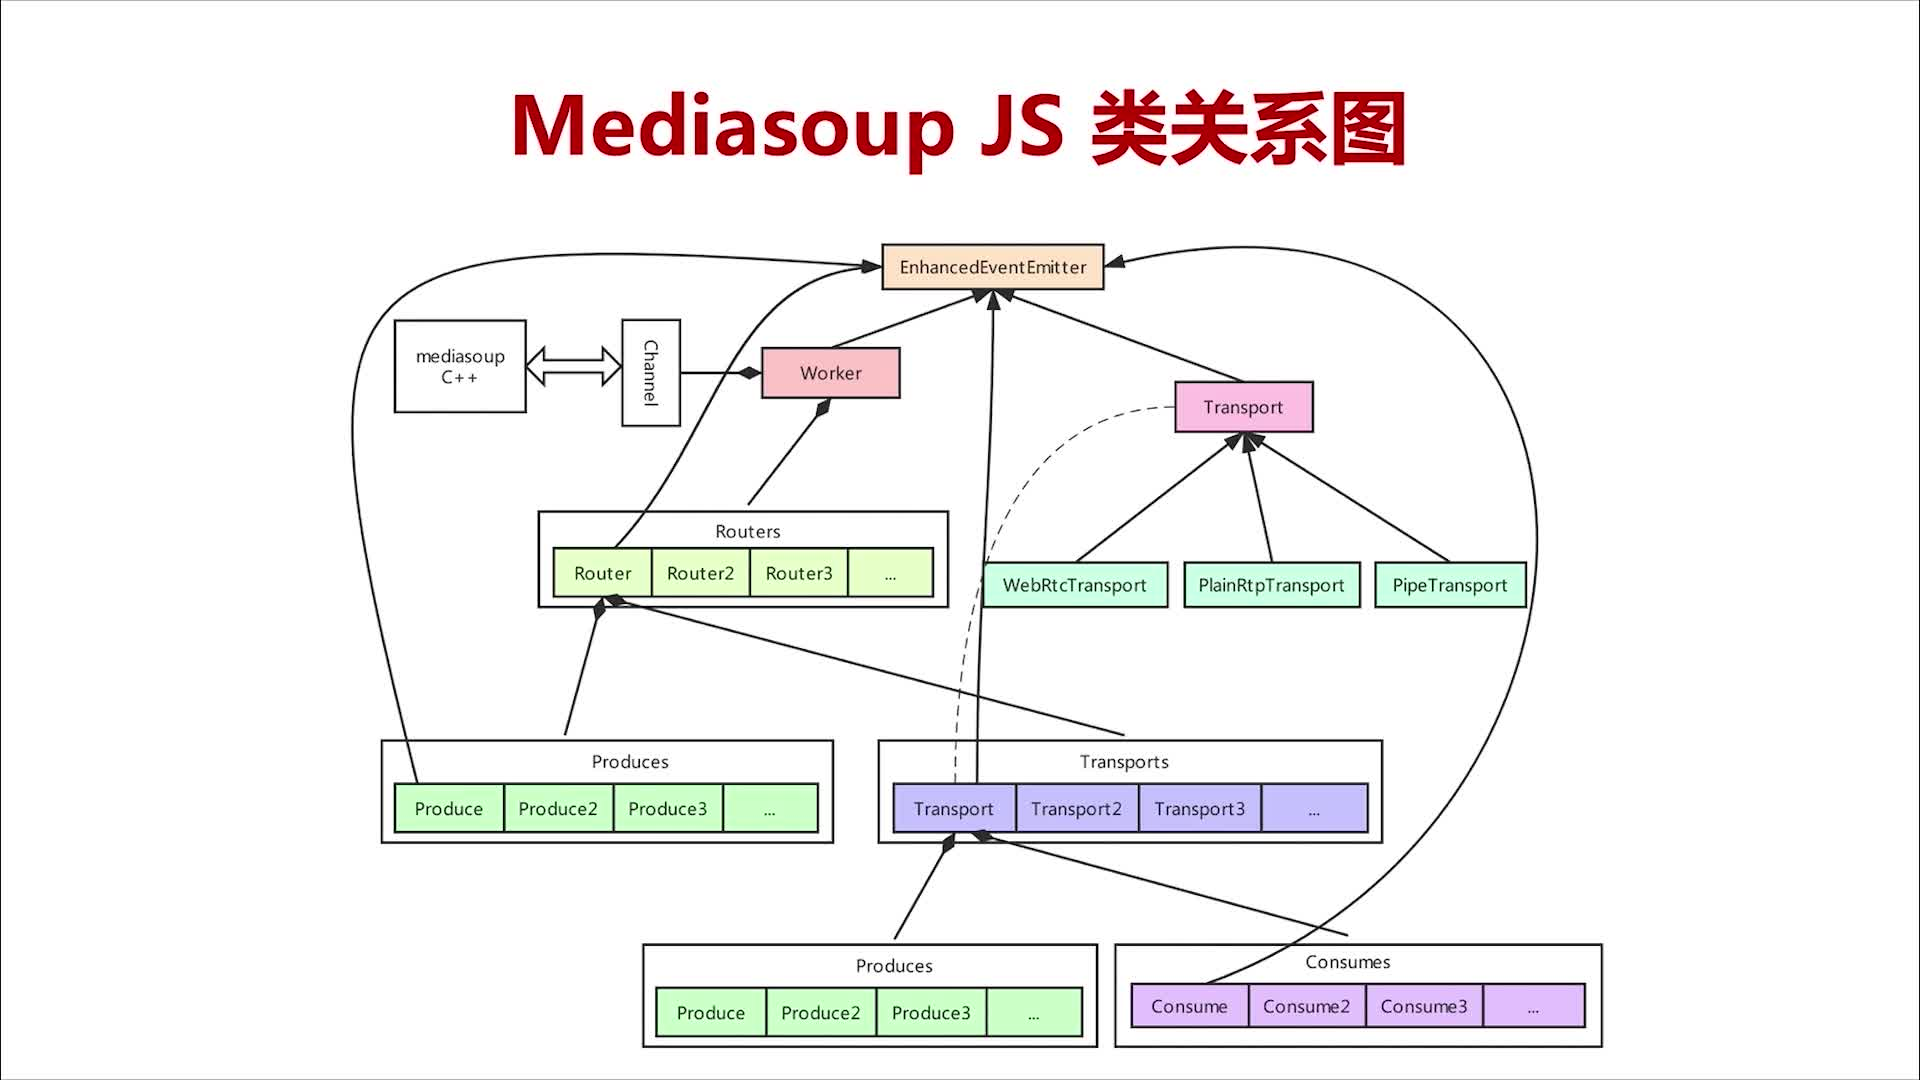 MediasoupJS类关系图